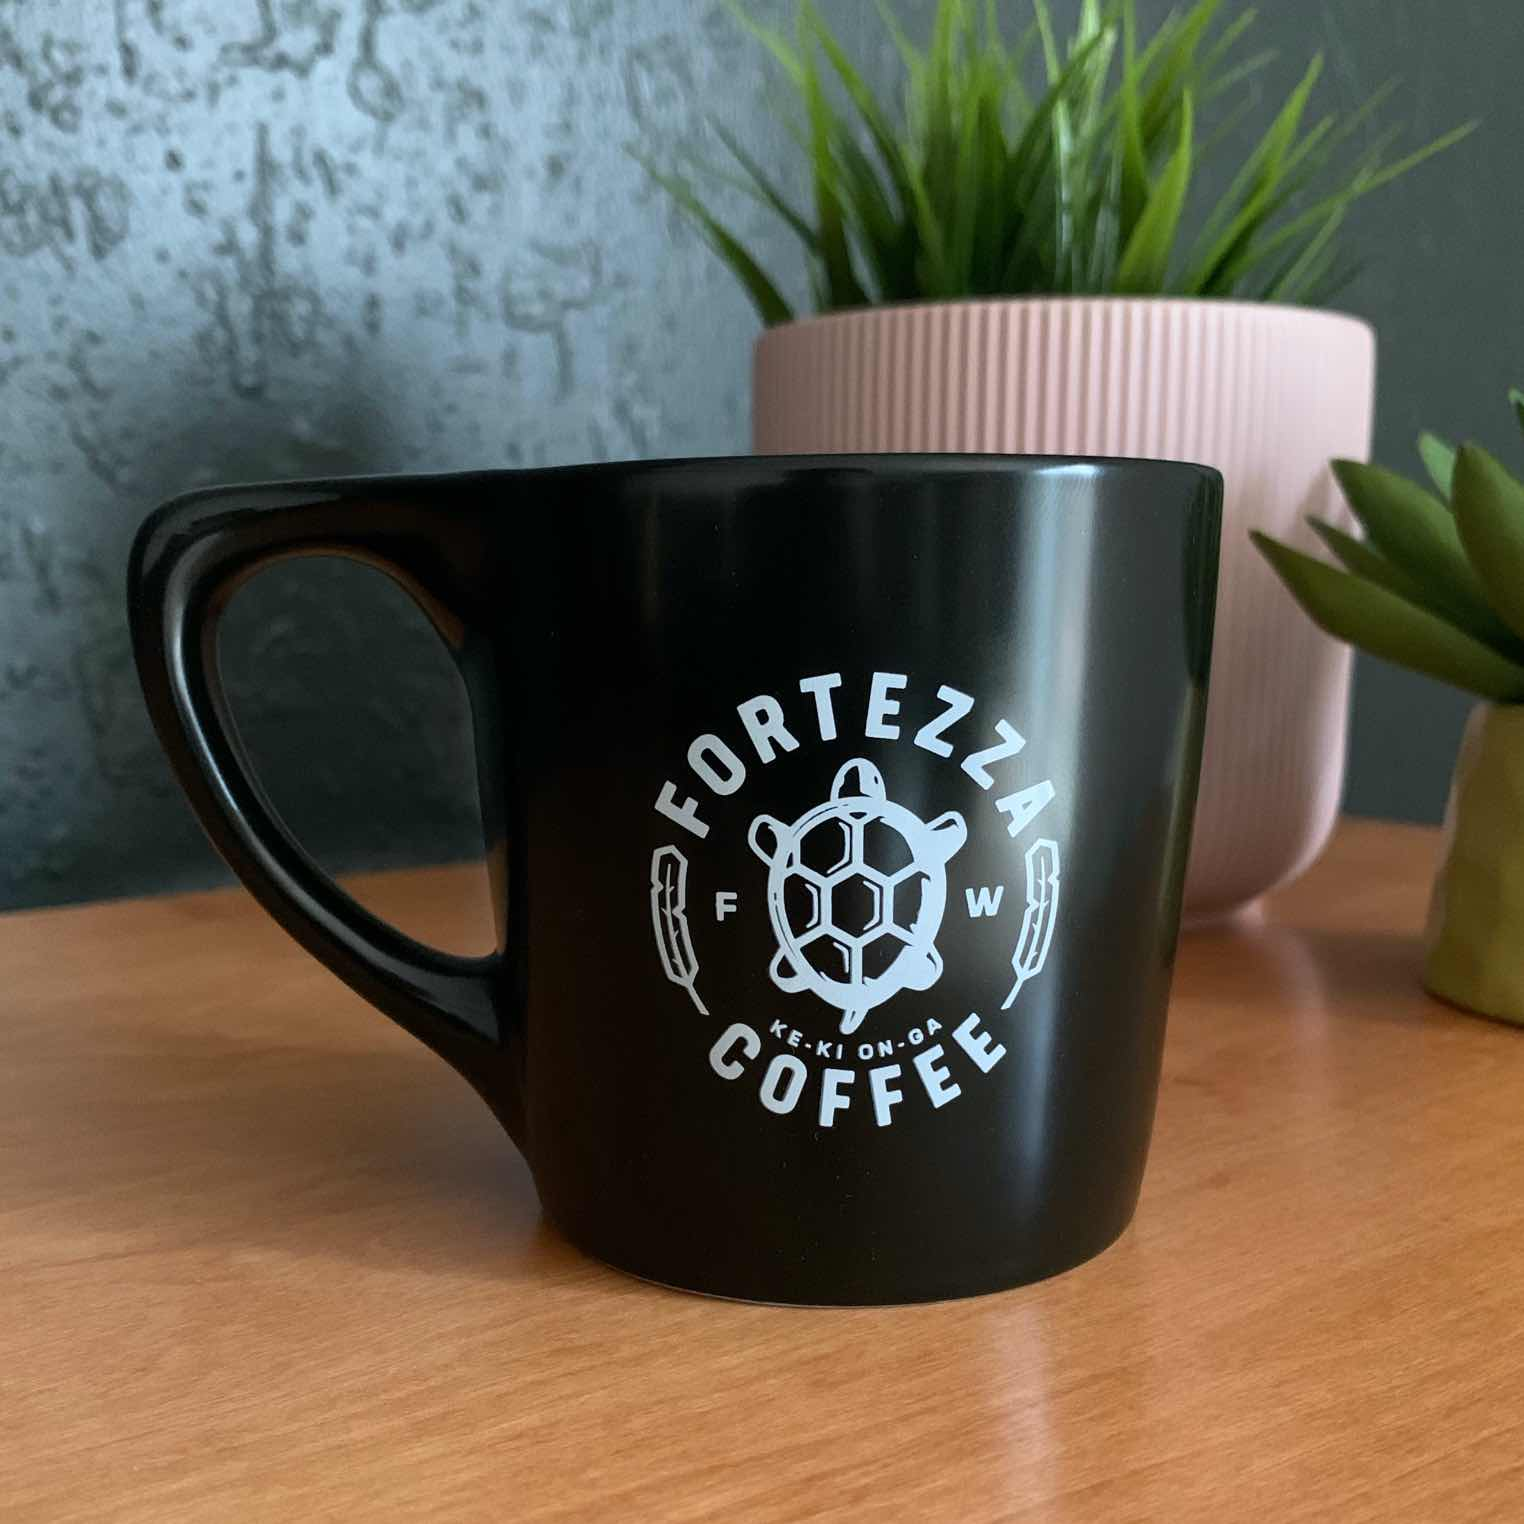 Black coffee mug with logo